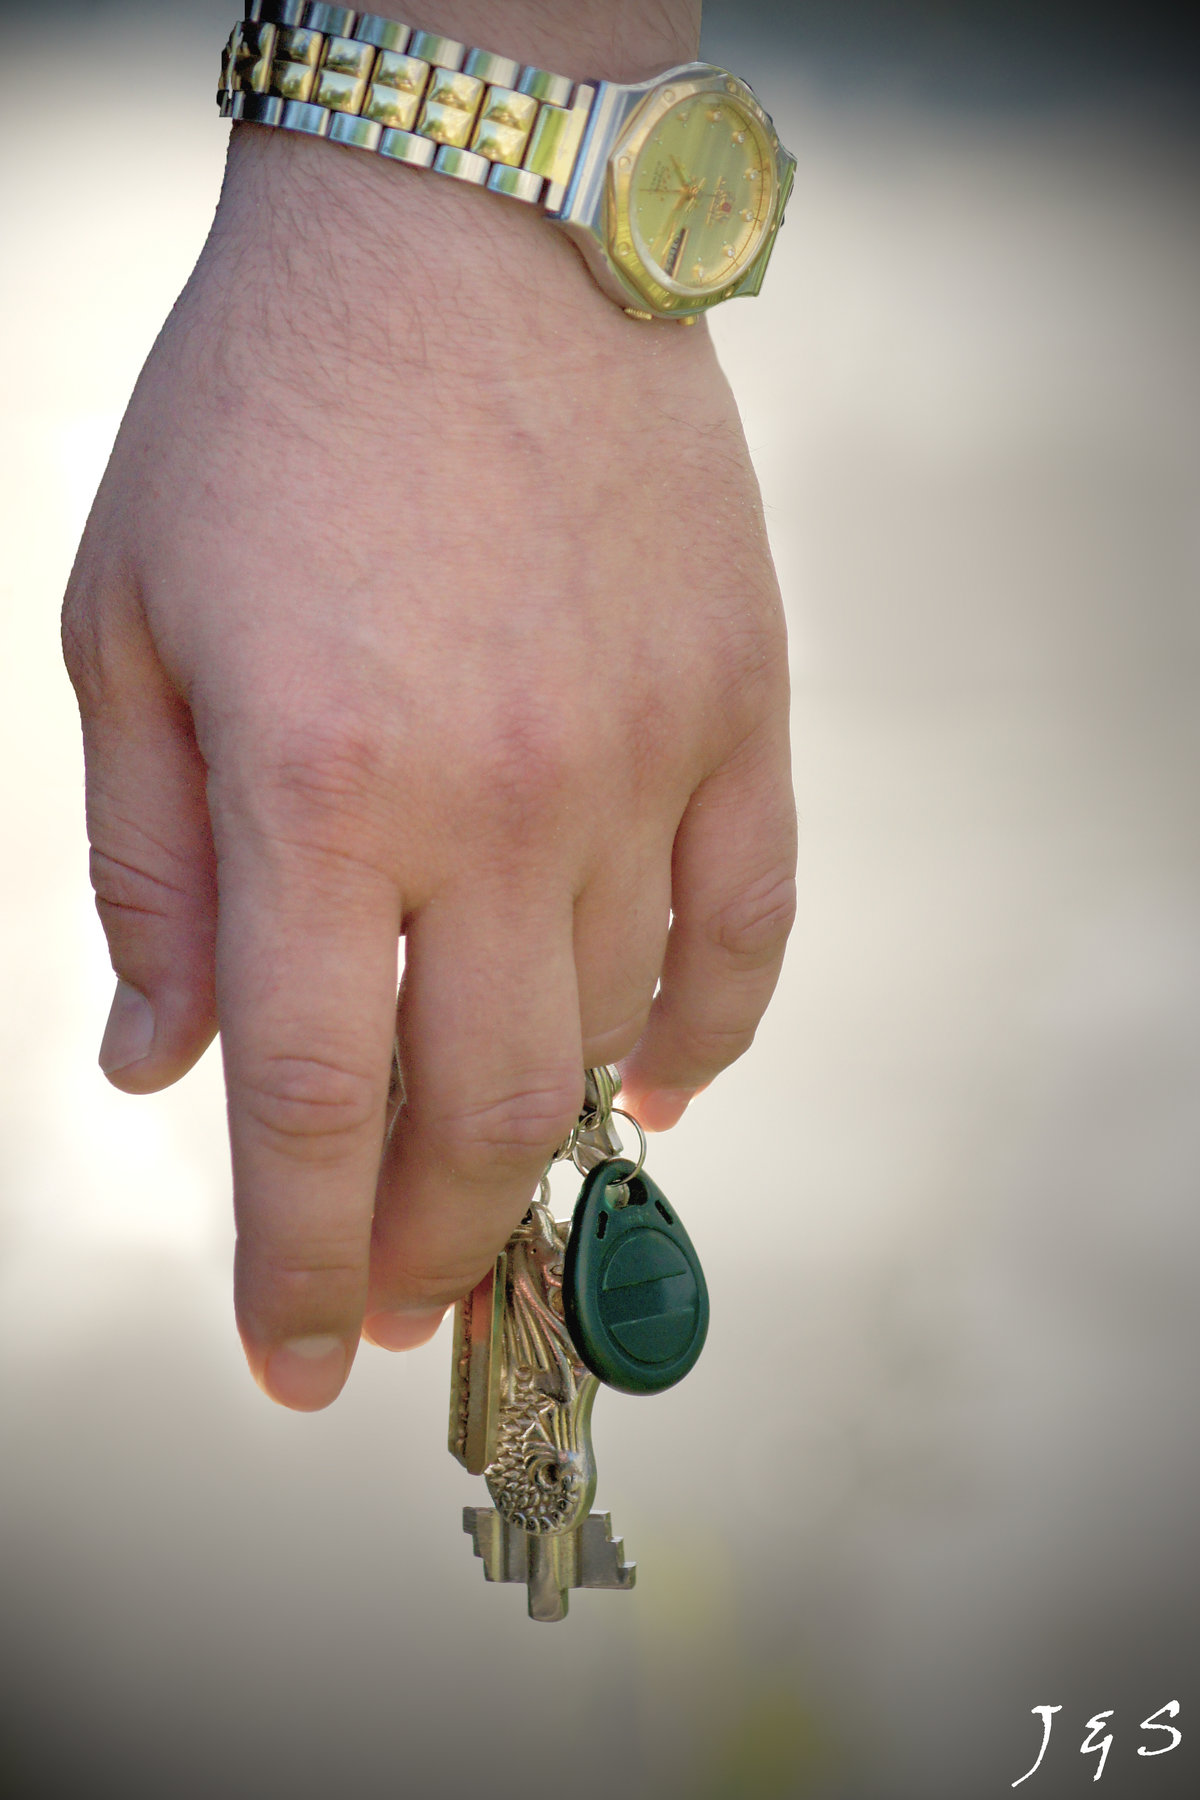 Картинка ключ в руке